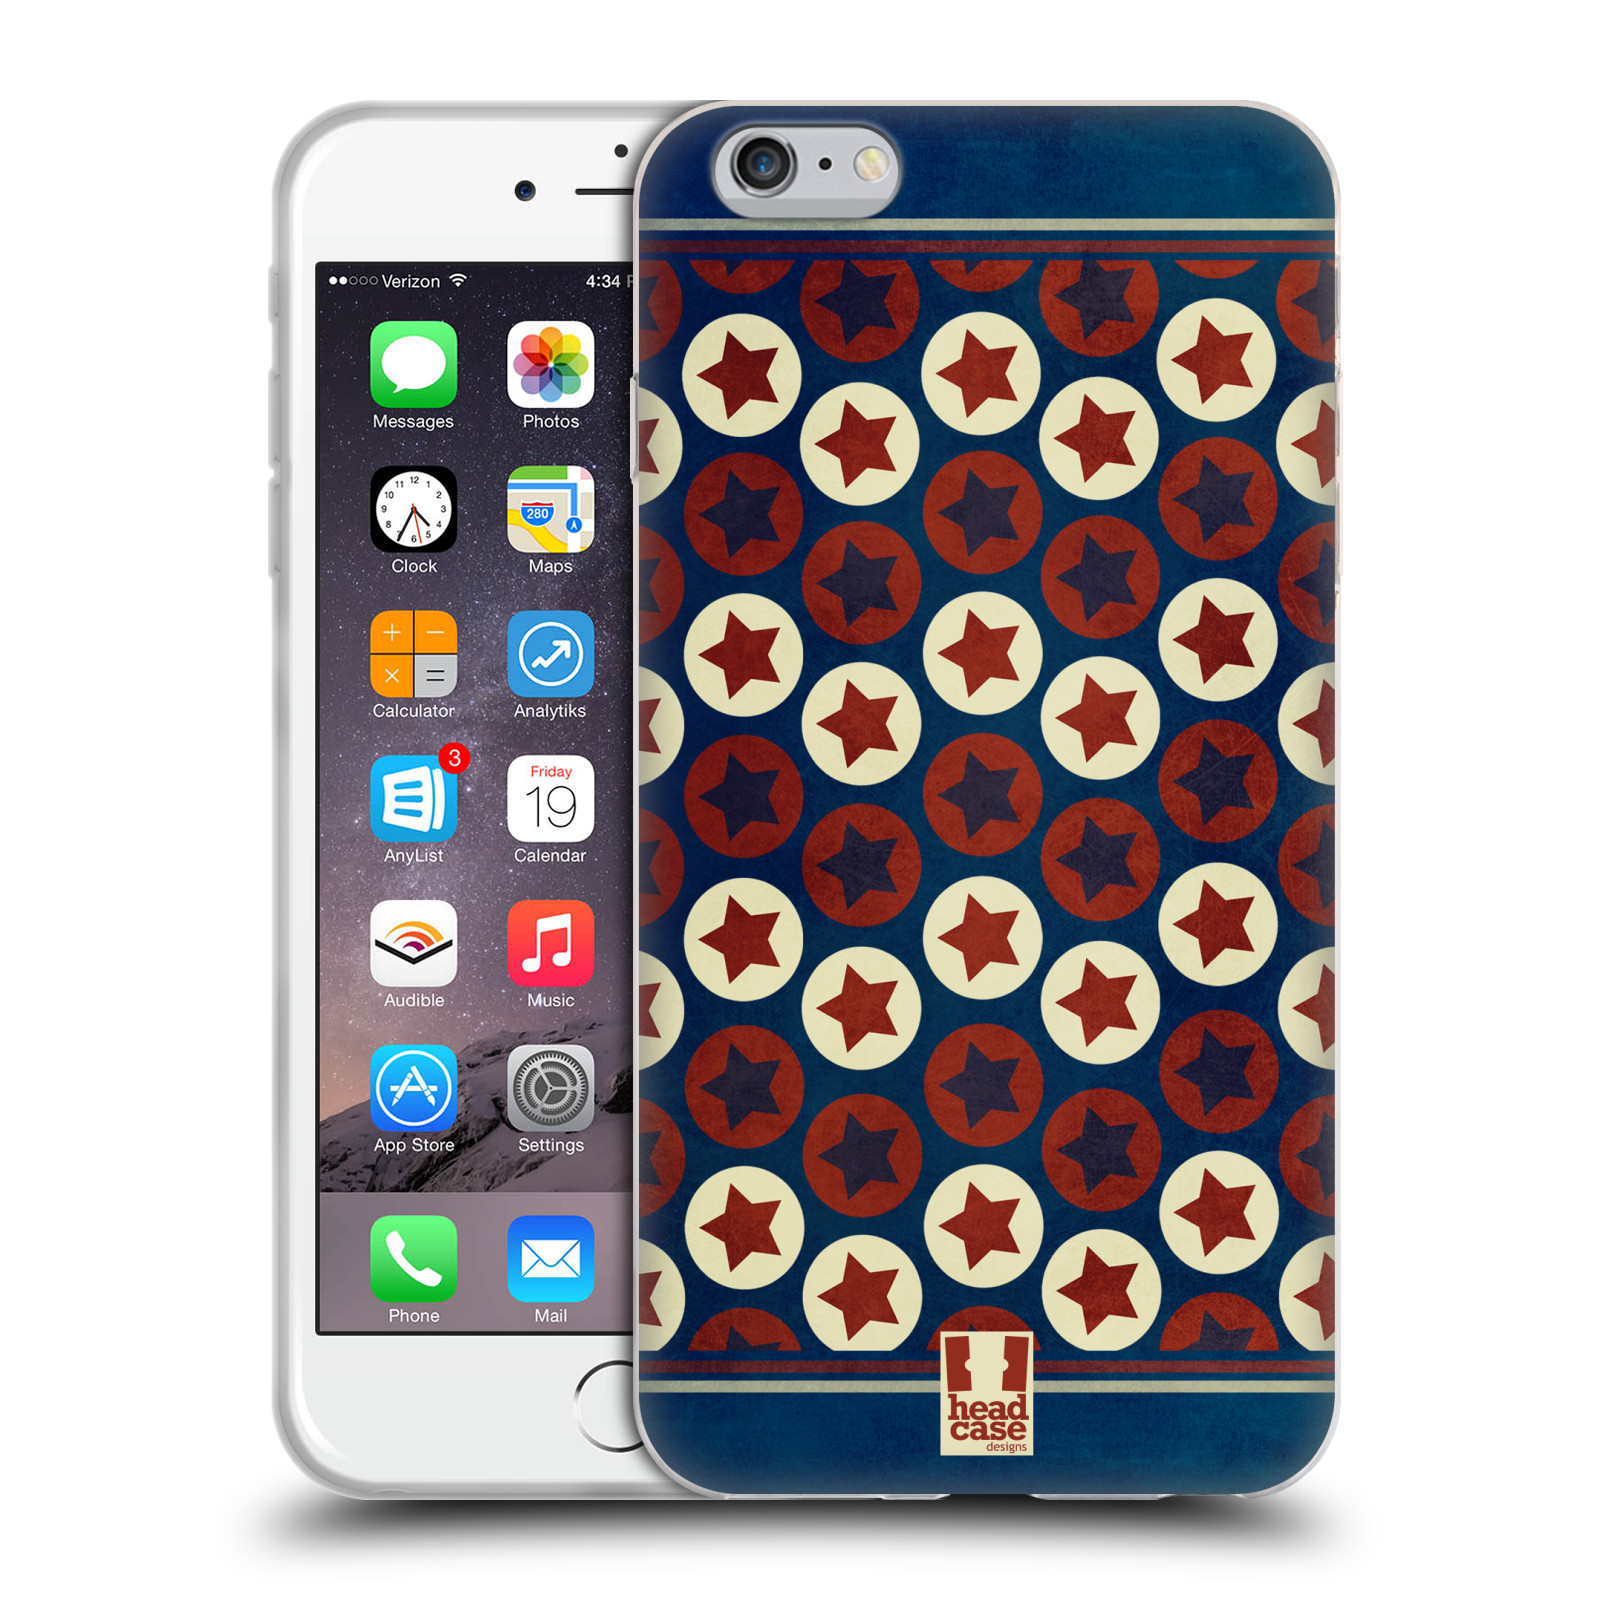 HEAD CASE silikonový obal na mobil Apple Iphone 6 PLUS/ 6S PLUS vzor USA VLAJKA KRUHY A HVĚZDY